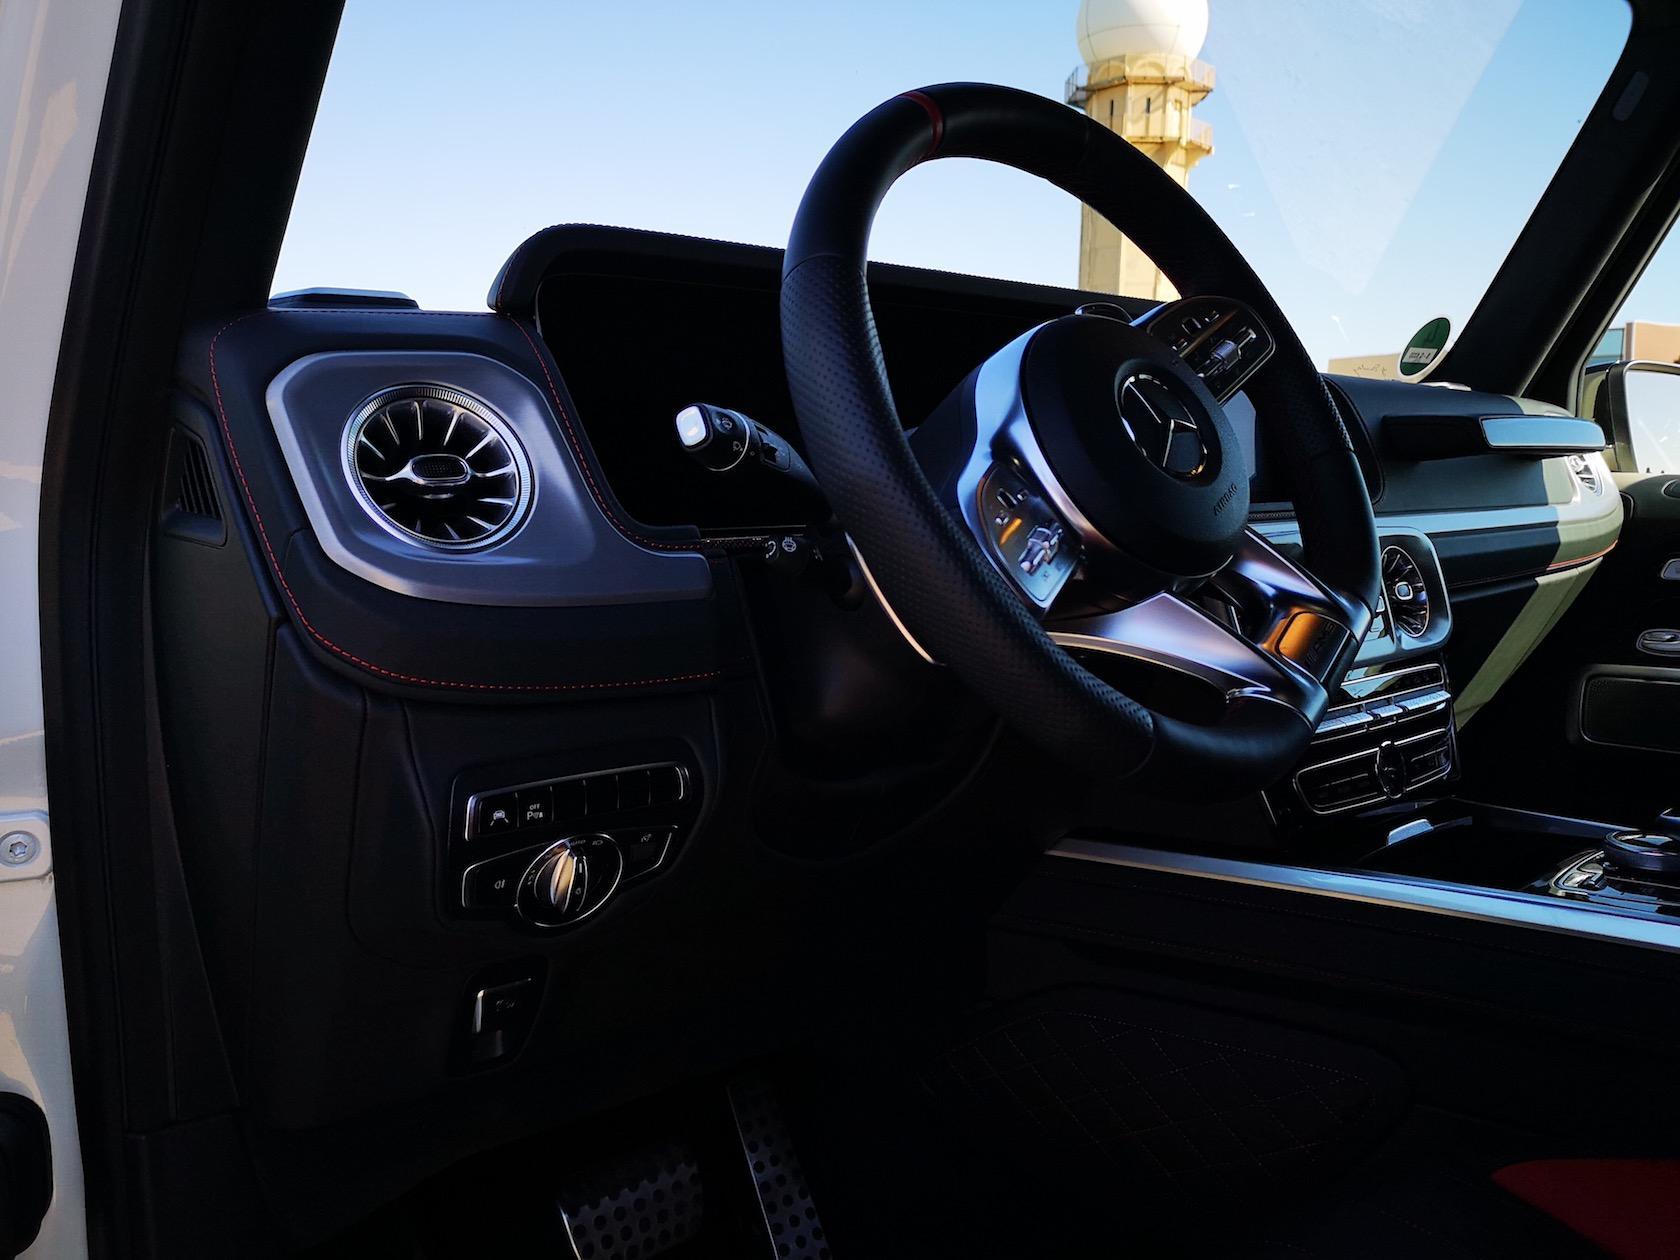 2019 Mercedes-Benz G 550 and AMG G63 first drive: leGendary - SlashGear